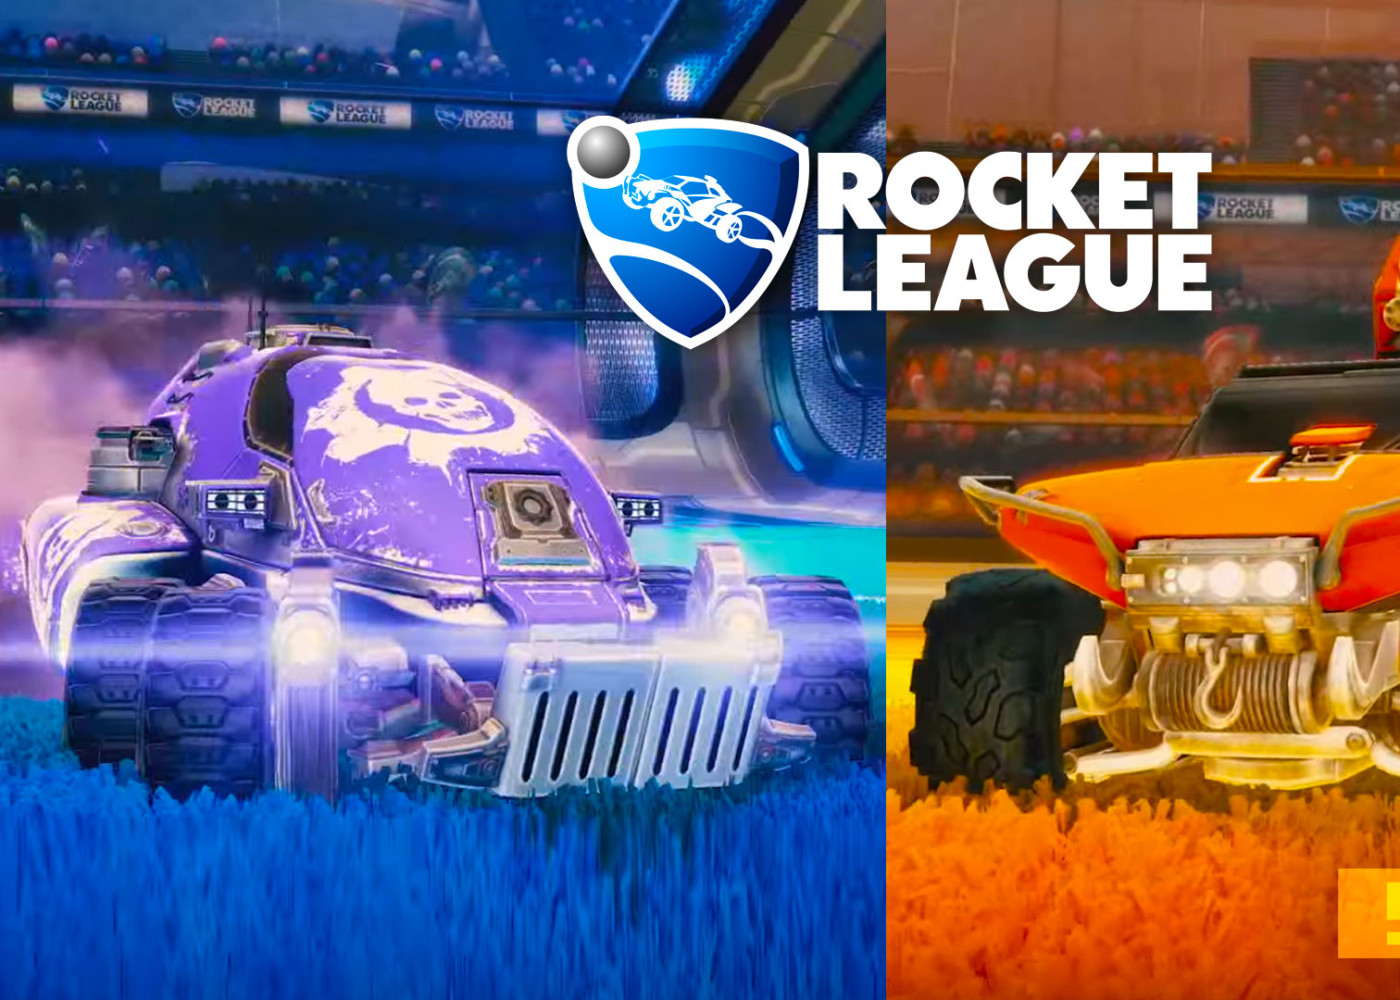 Rocket league. hogsticker. halo. xbox. the action pixel. @theactionpixel. gears of war. armadillo.